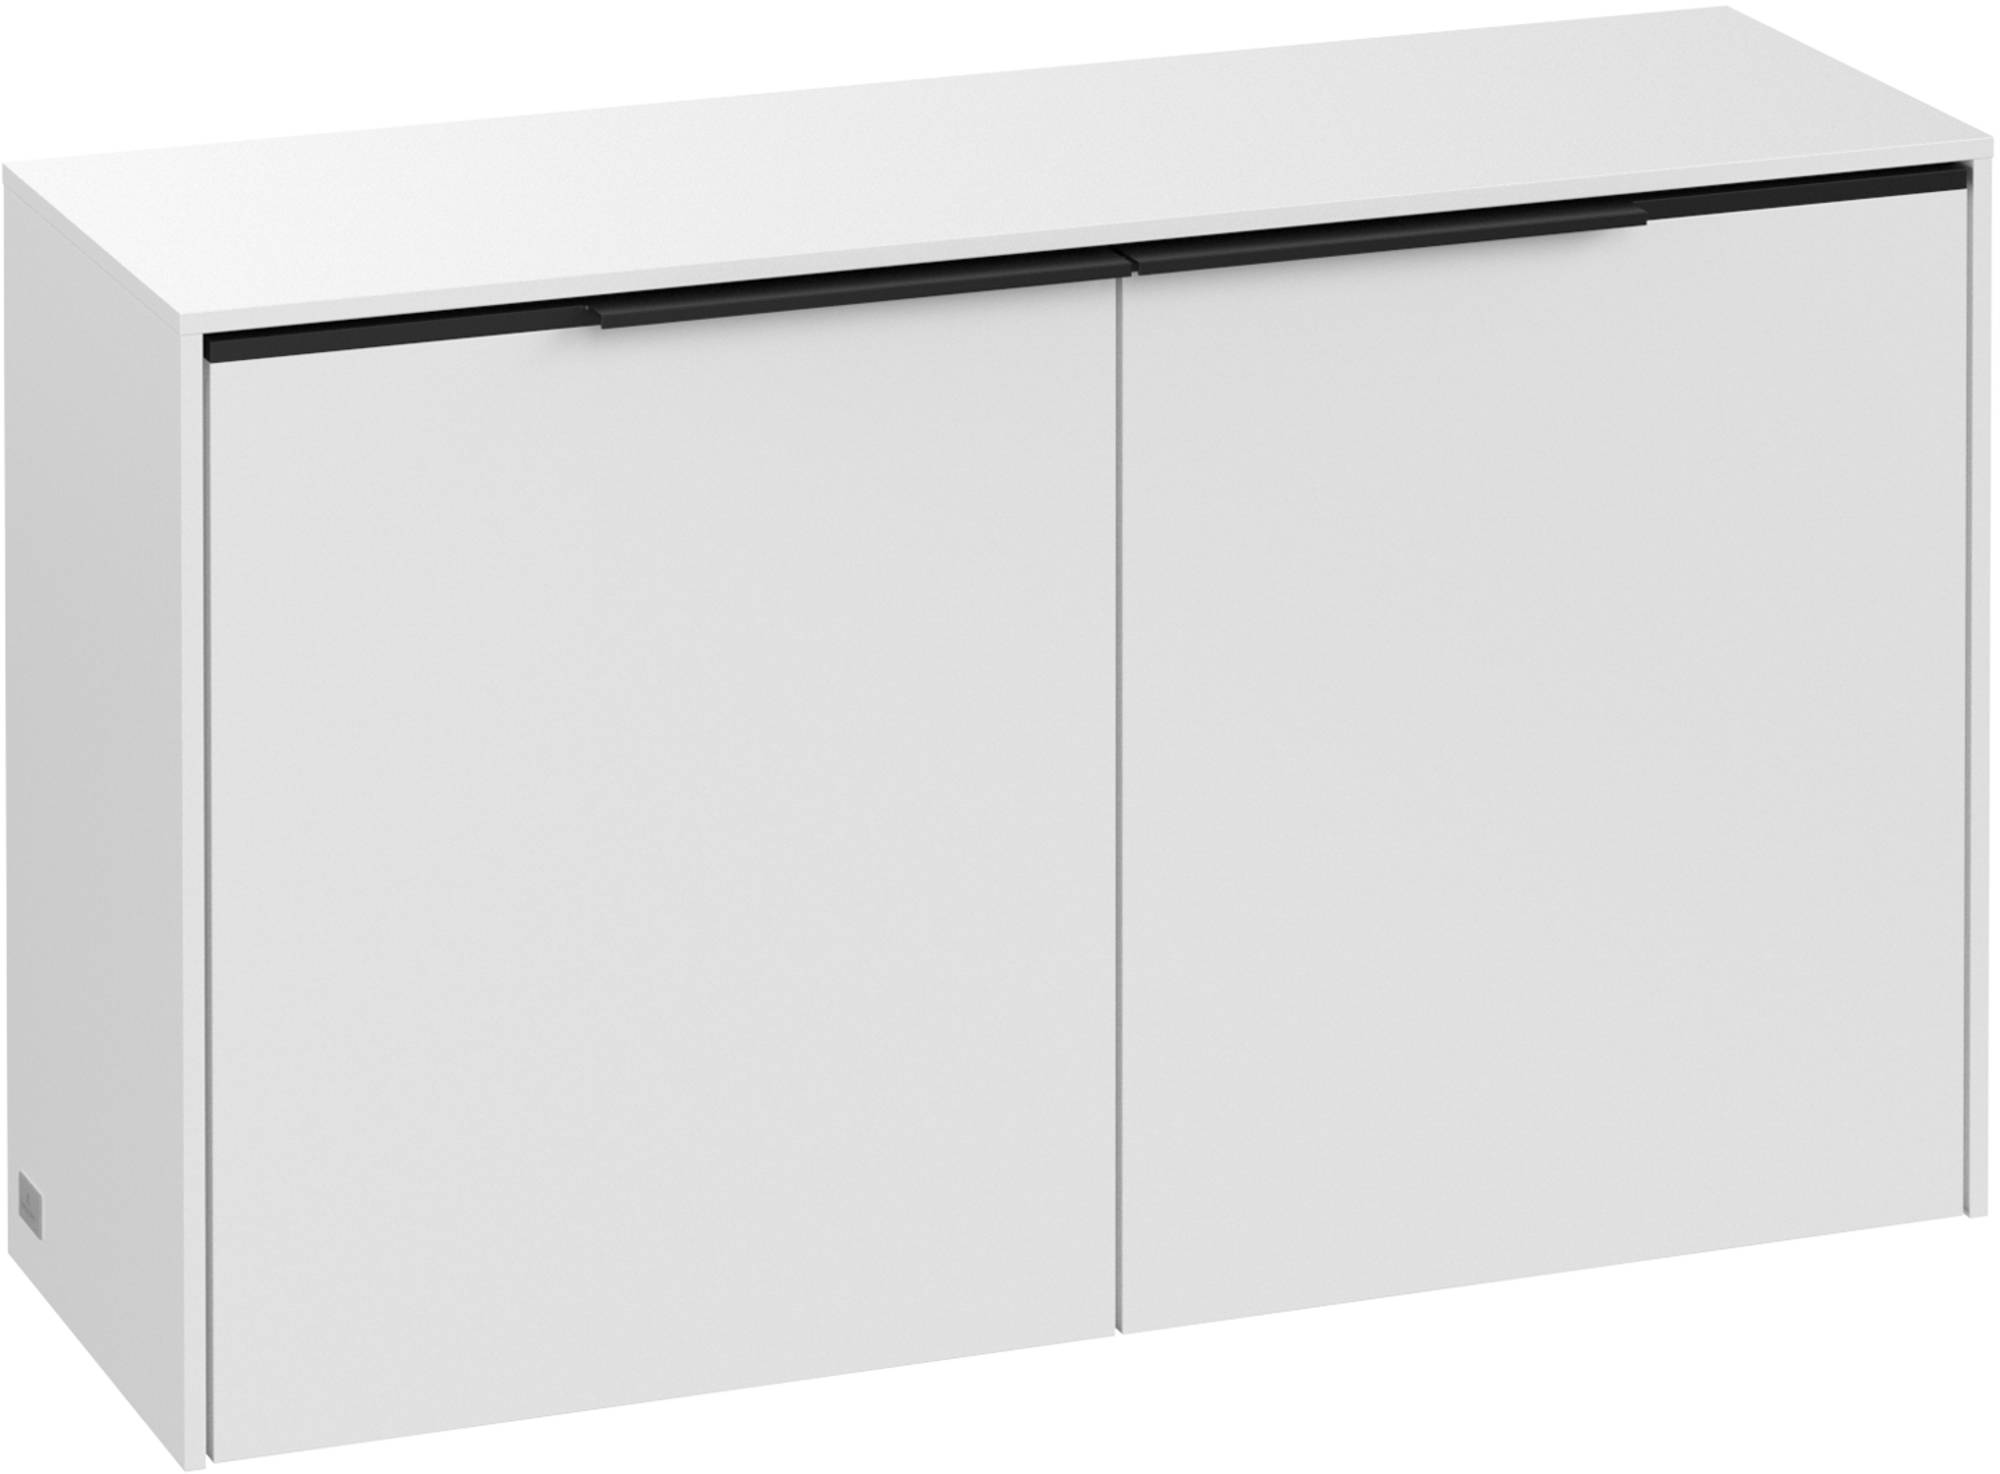 Villeroy & Boch Subway 3.0 Sideboard 72,8x25,6x42,3 cm Pure White